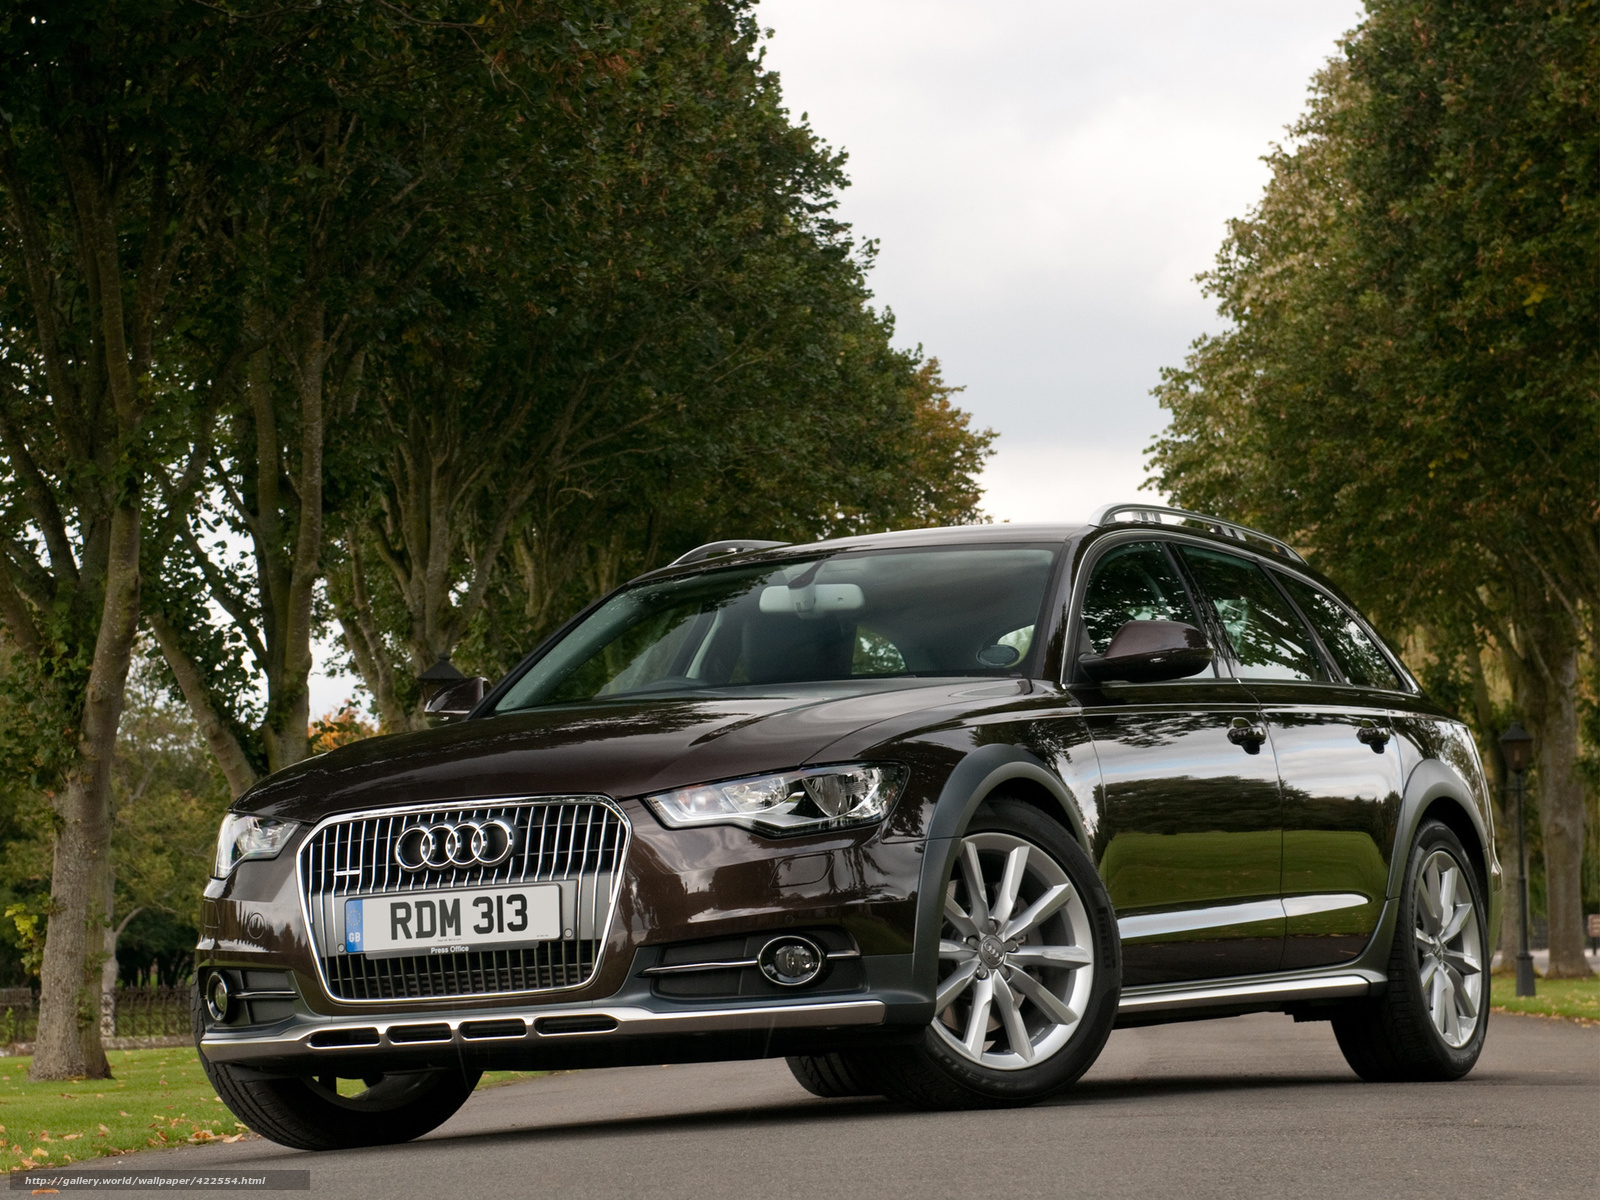 Audi a6 allroad cross_over_power pinterest audi a6 allroad audi a6 and audi